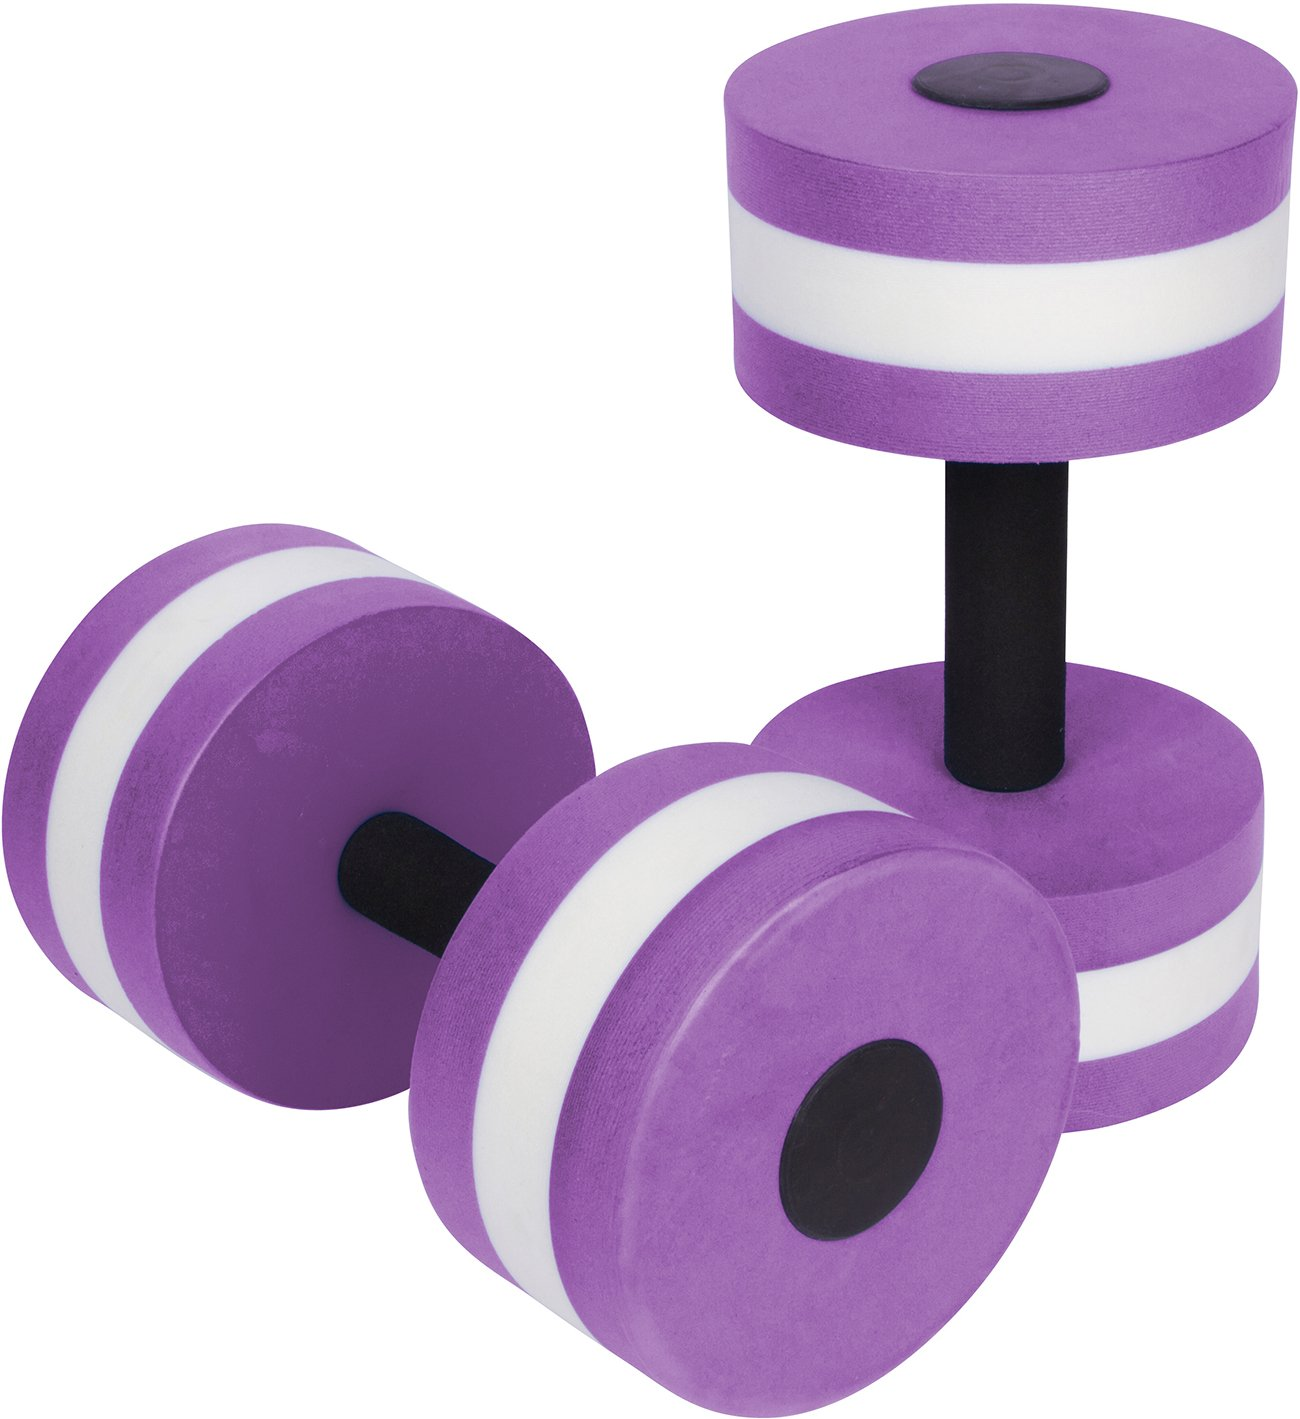 Trademark Innovations Aquatic Exercise Dumbells - Set of 2 Foam - for Water Aerobics (Purple)